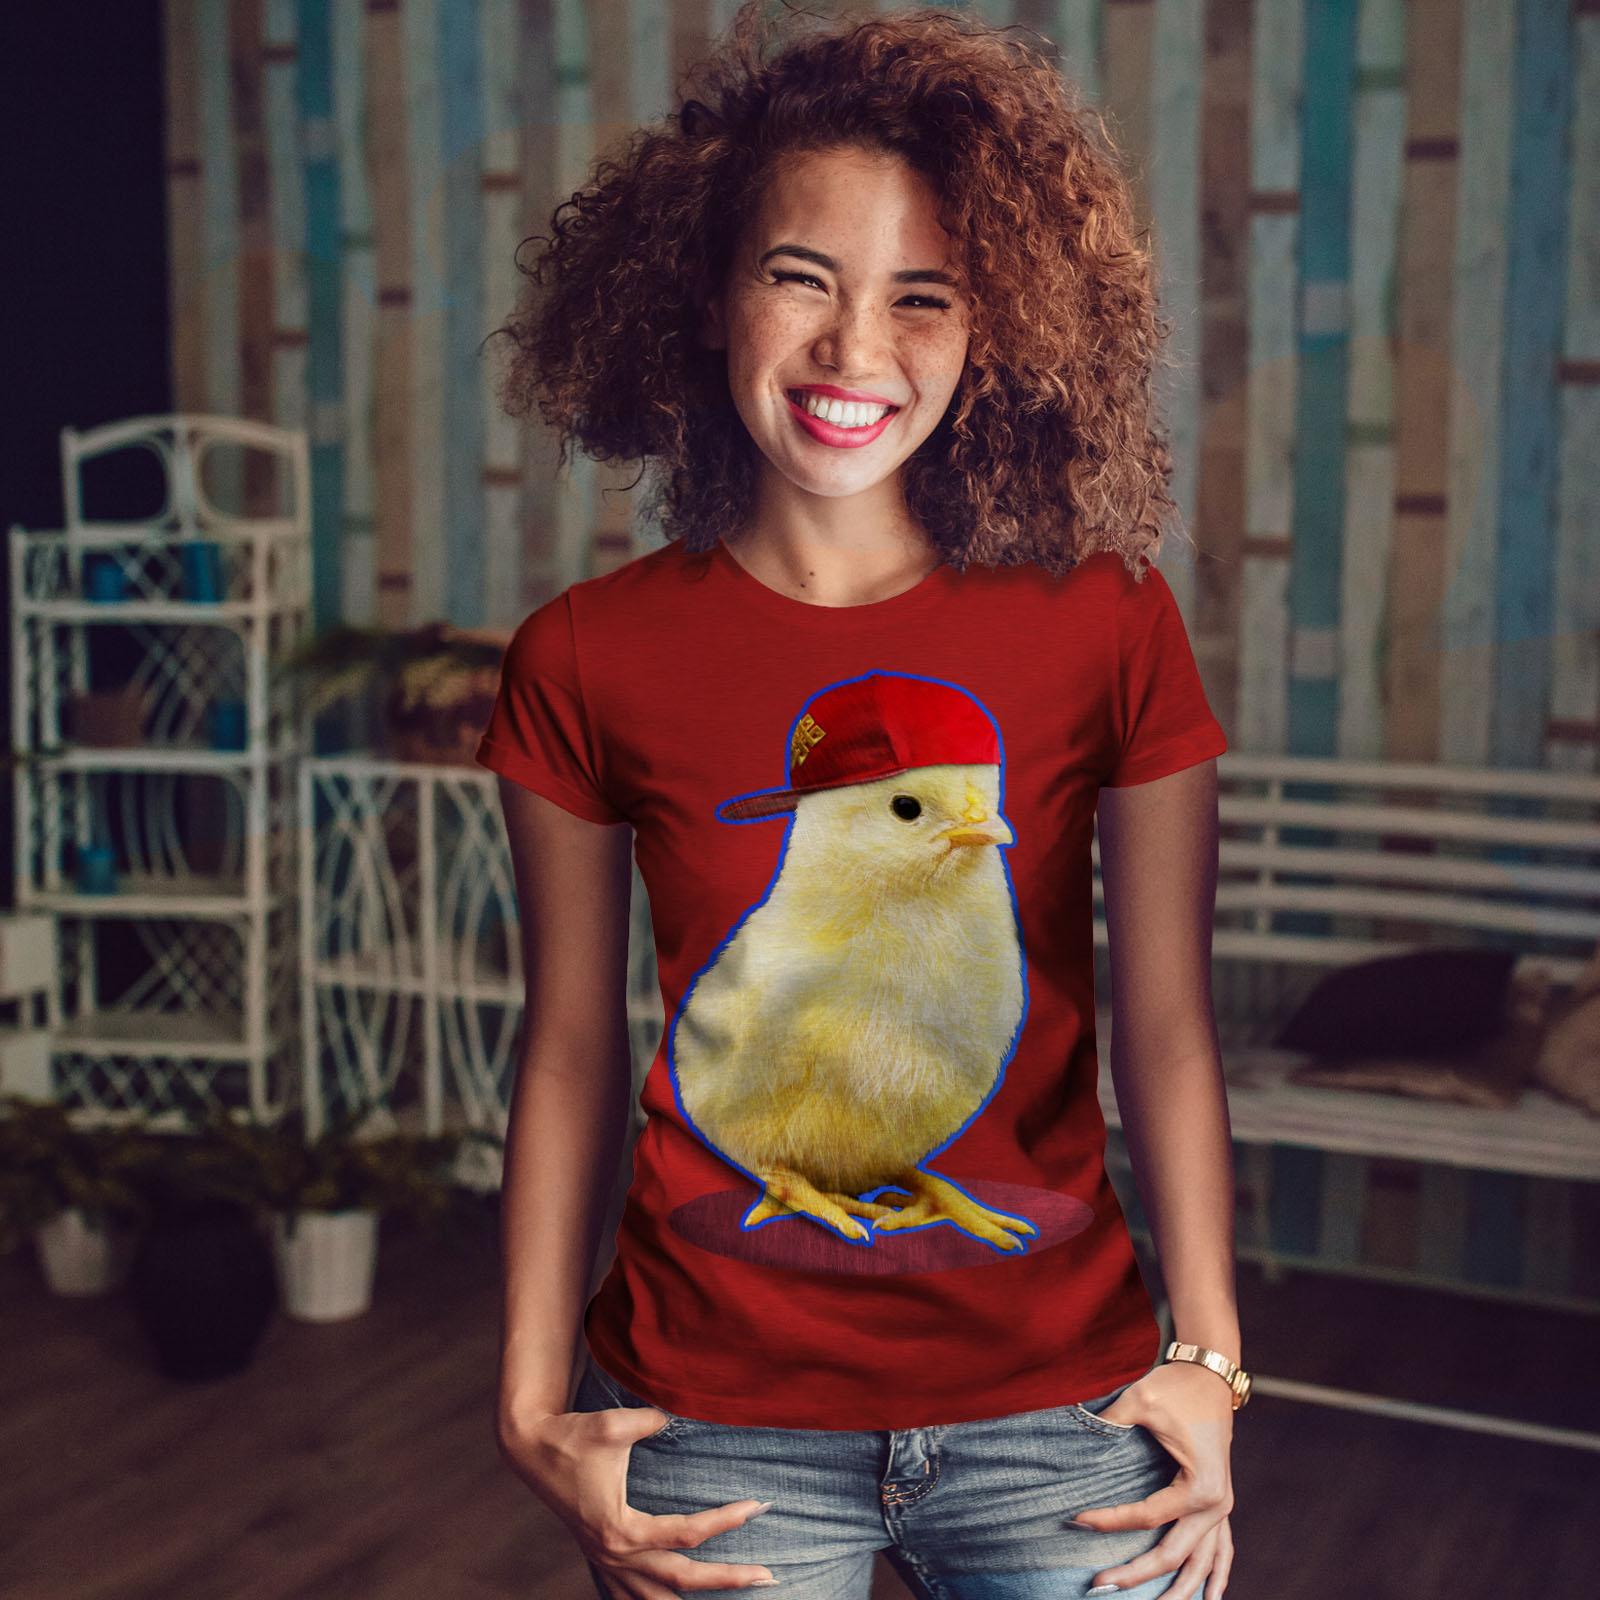 poulet Casual Design Imprimé Tee Wellcoda Gangster mignon Imprimer T-shirt femme